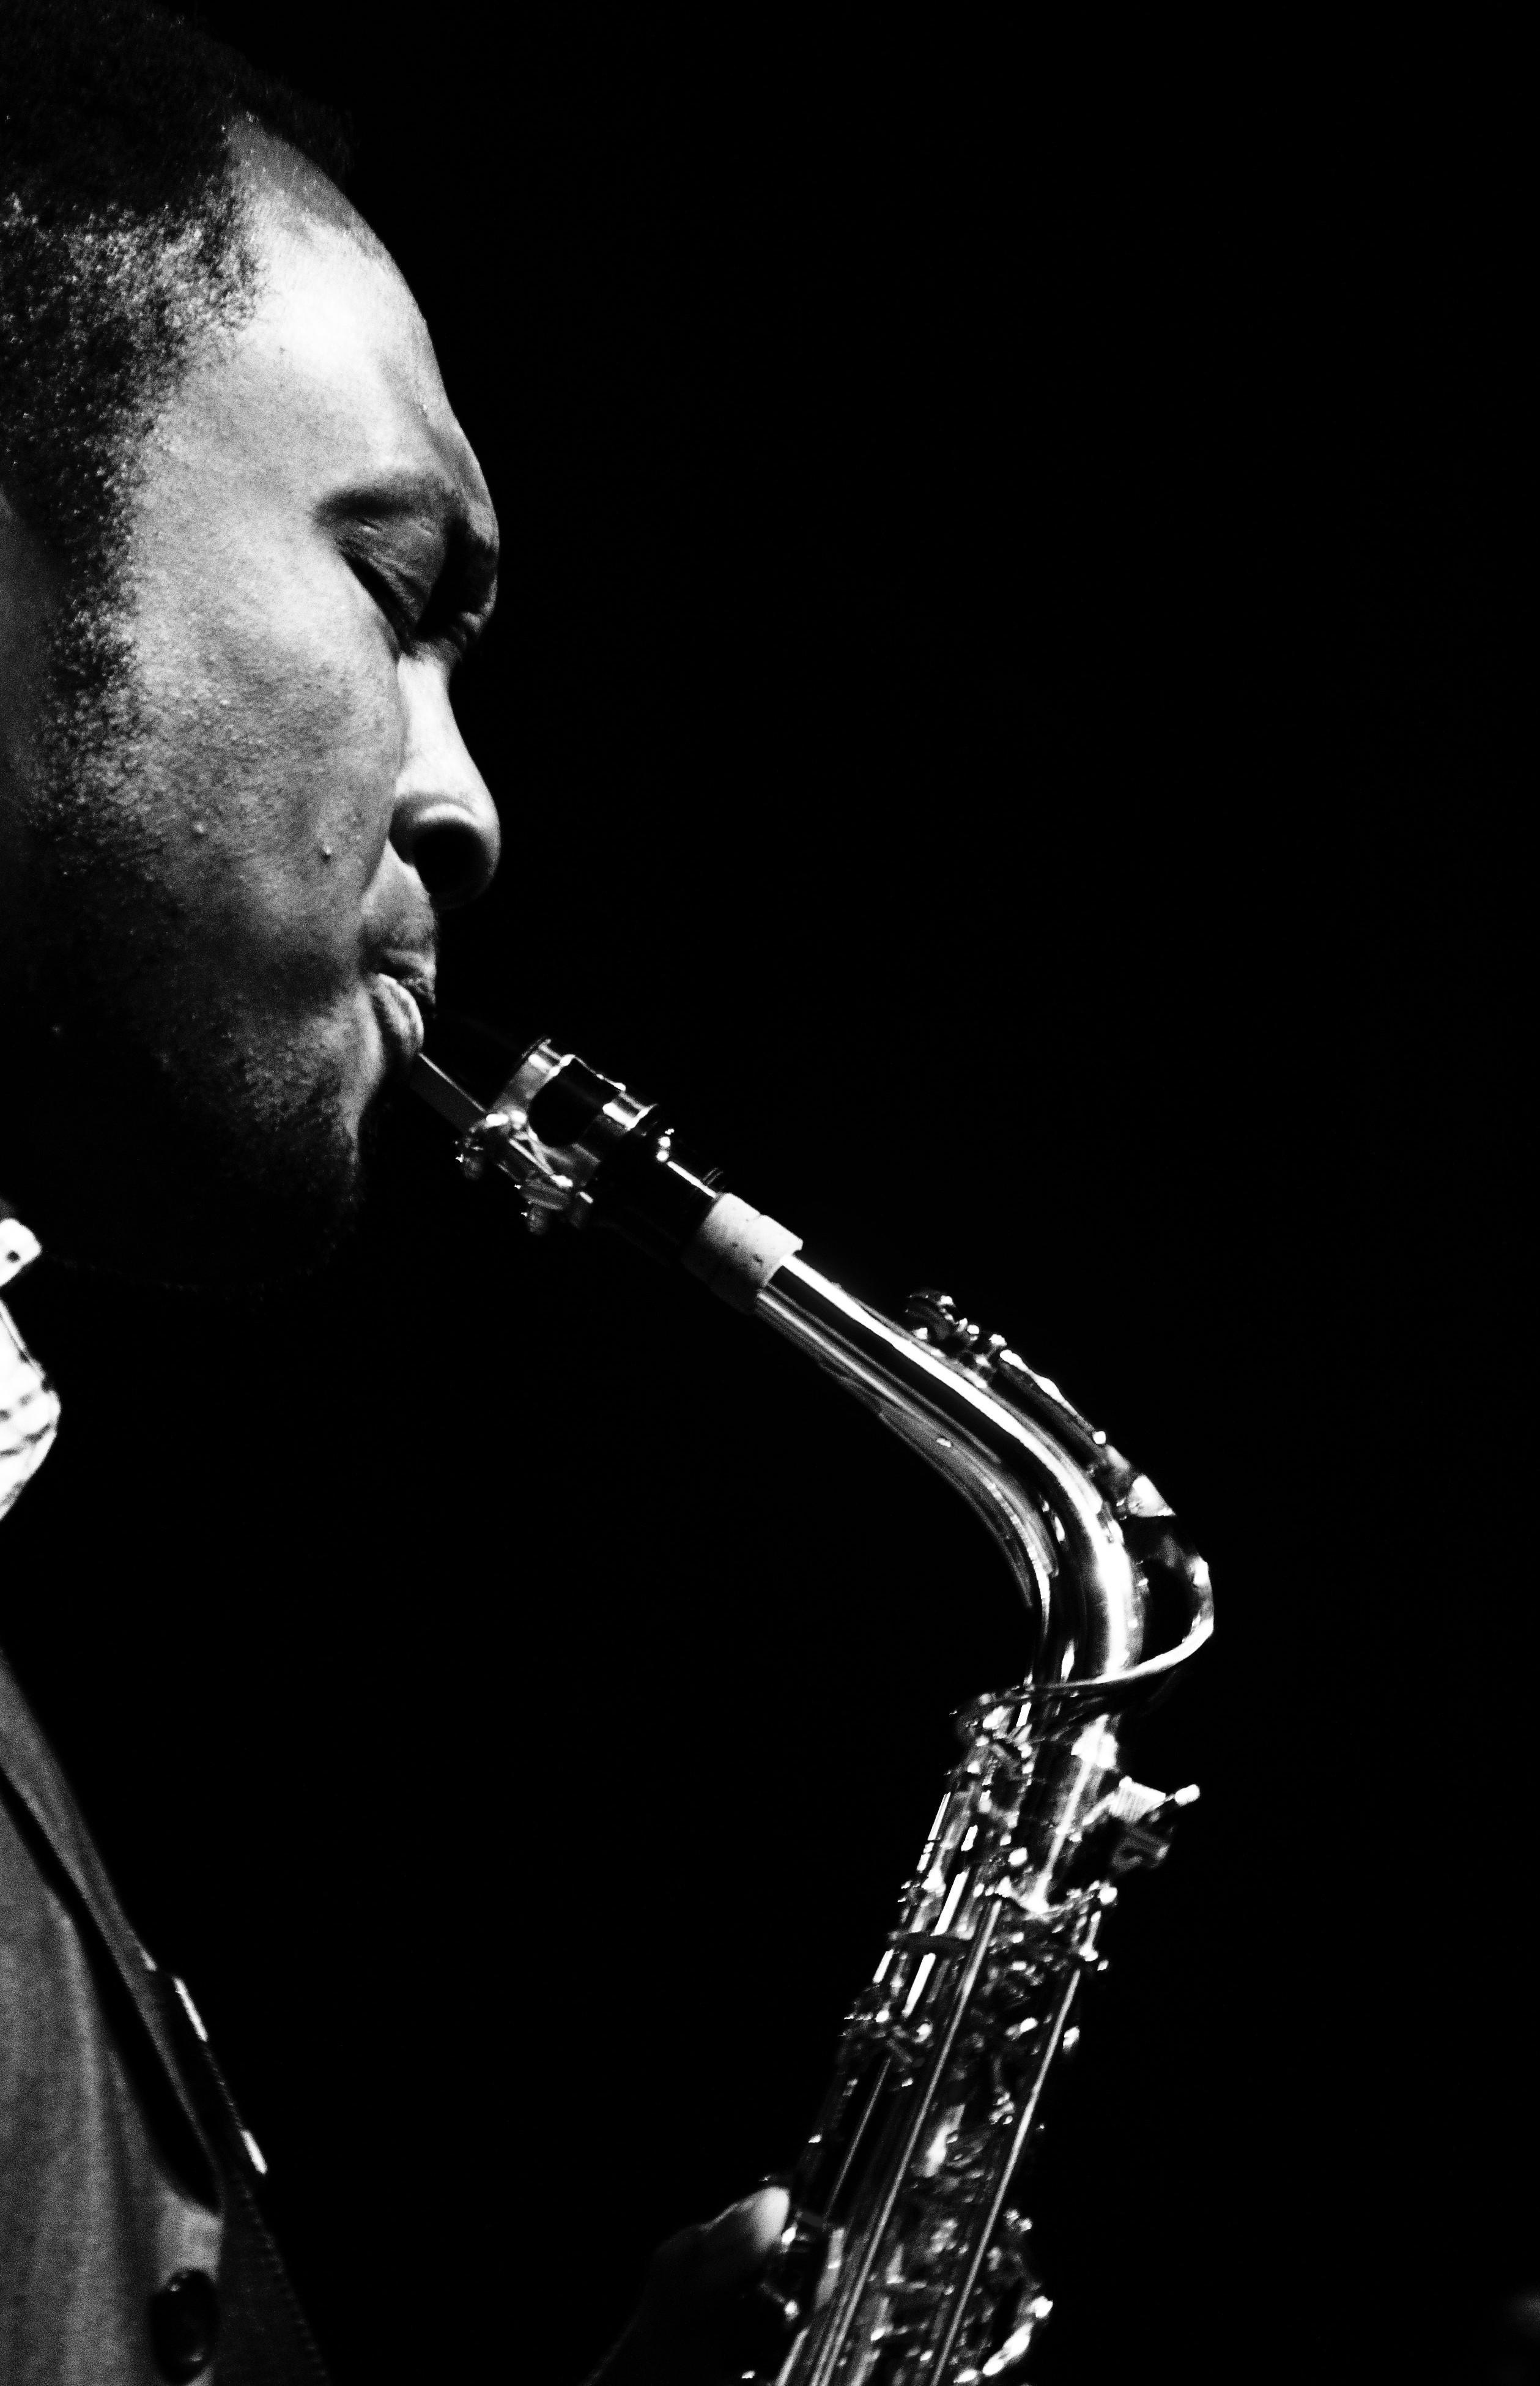 London Saxophone School undefined classes in London